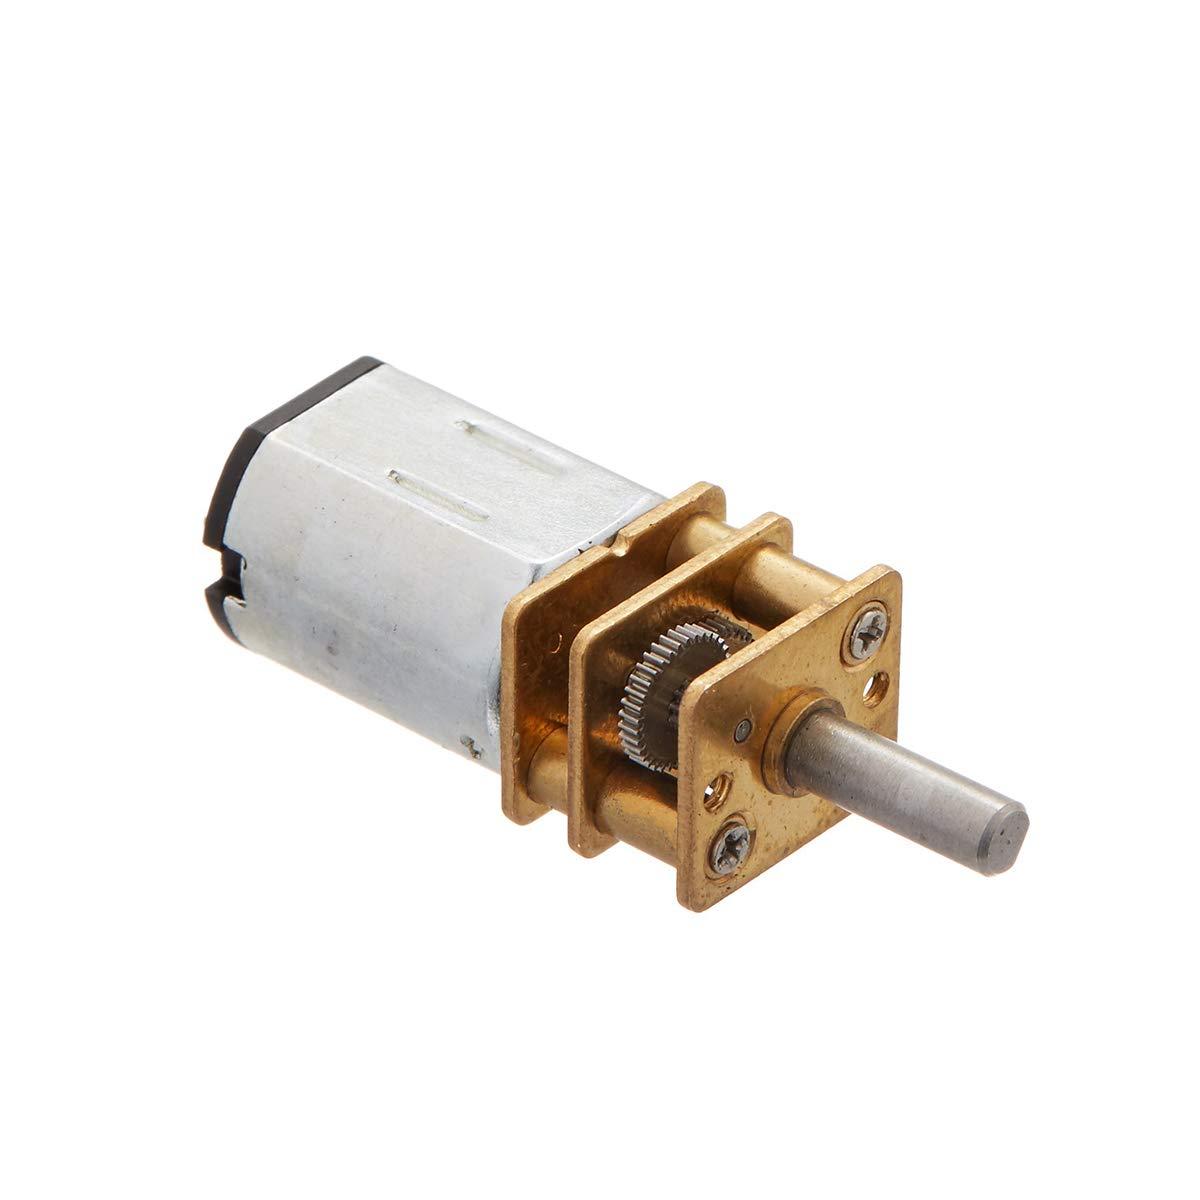 1Pc DC6V 050 Micro Gear Motor Metar Gear Reducer Motor For Car Model DIY